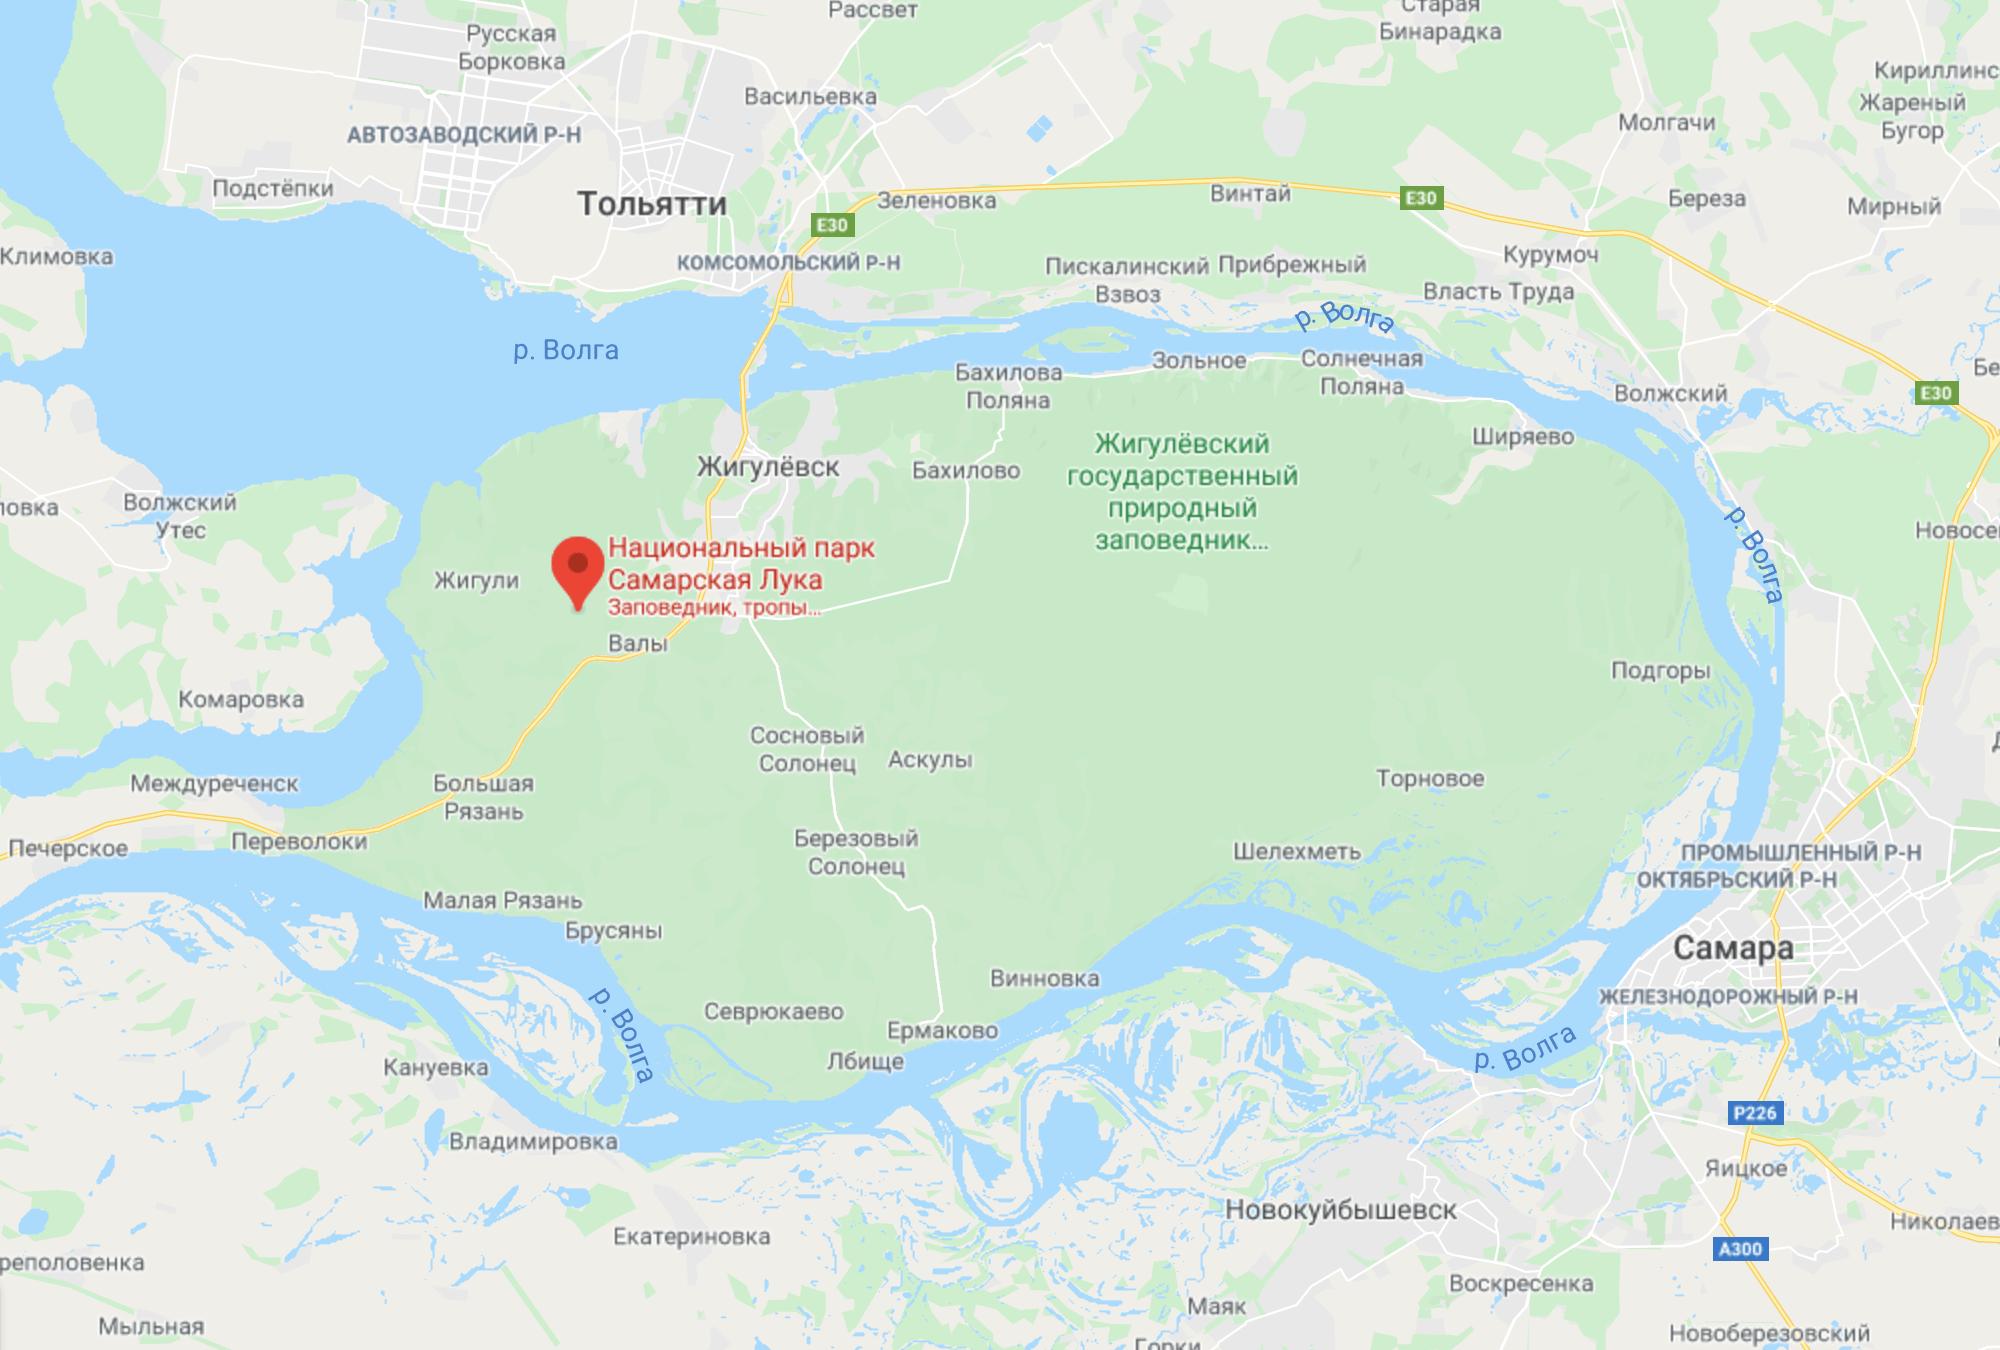 Площадь национального парка «Самарская Лука» — 134 000га